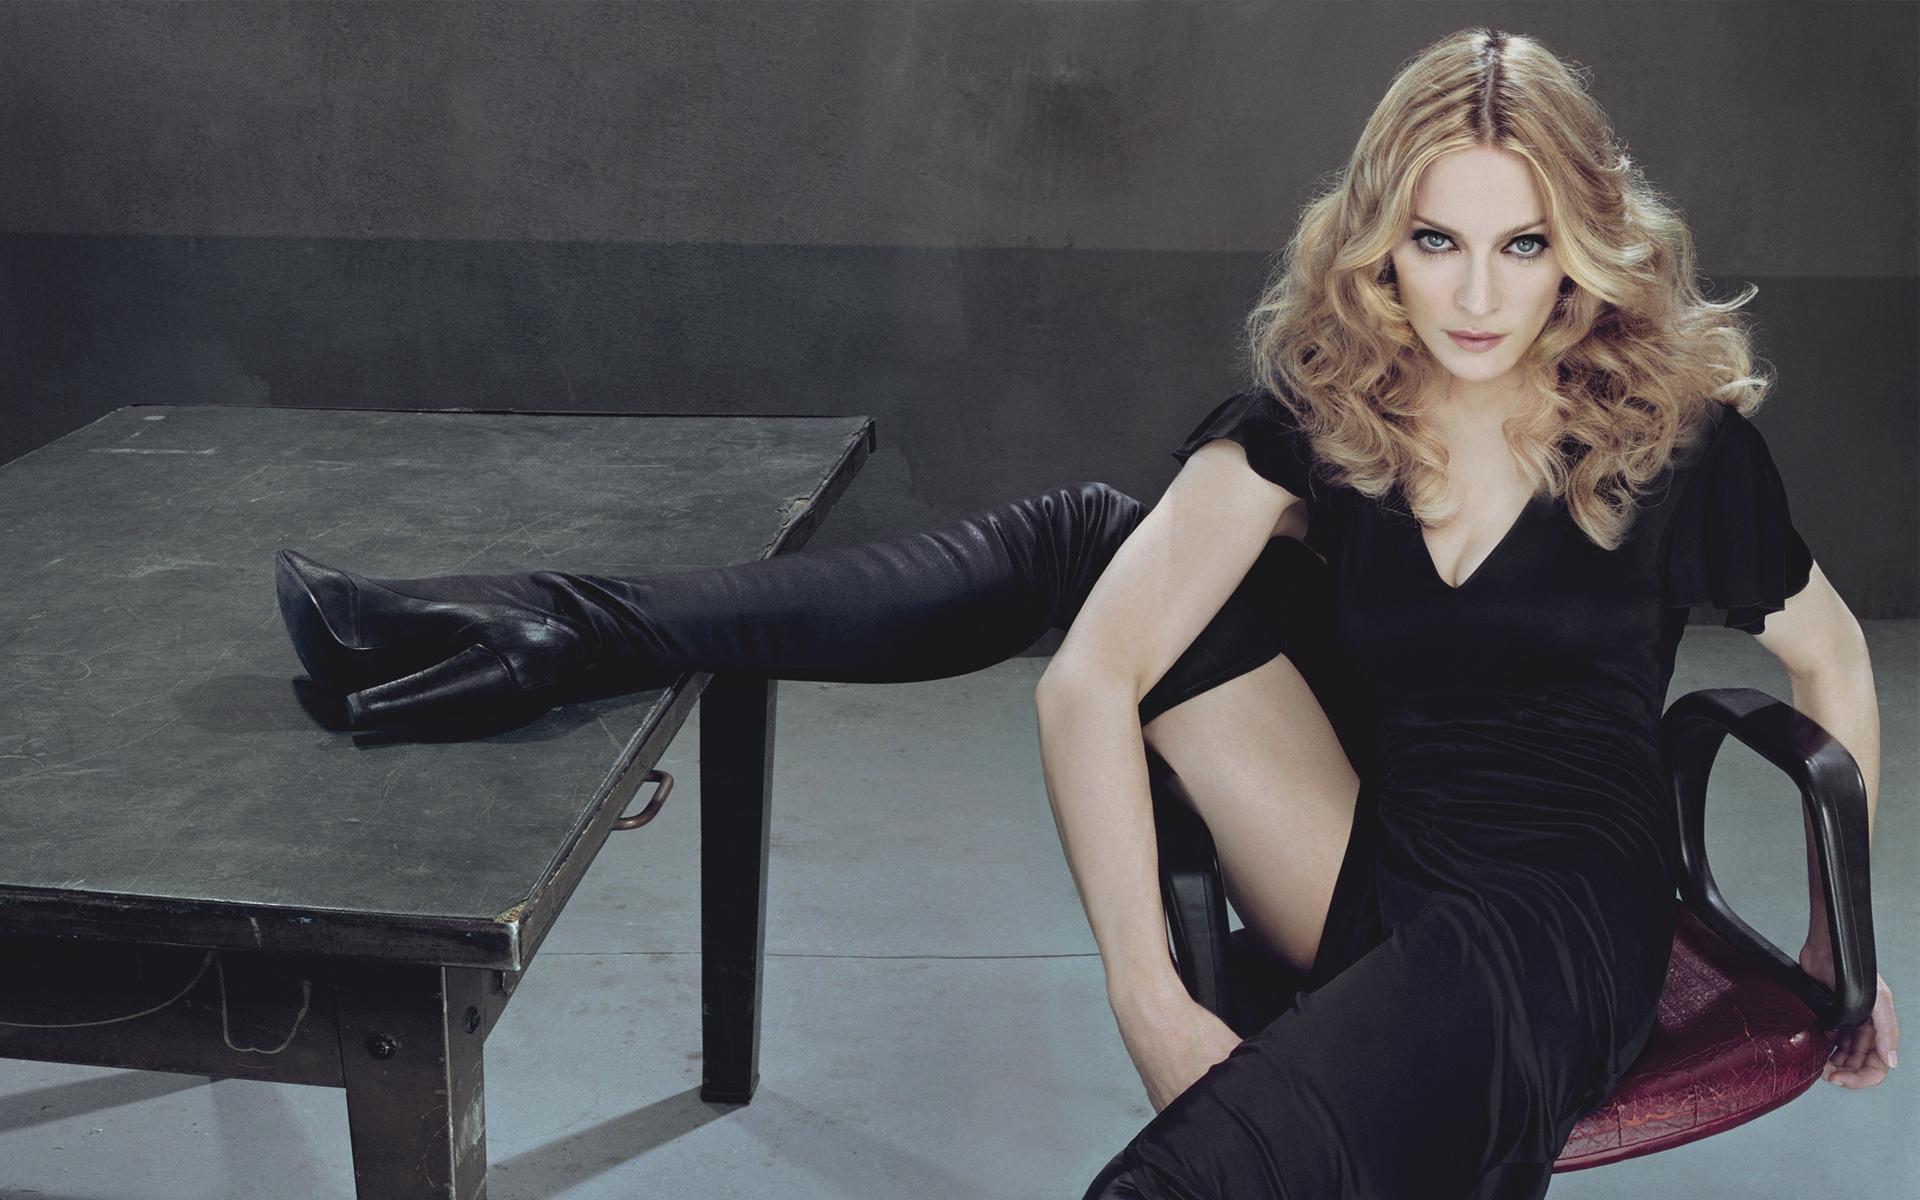 21 Fondos De Pantalla De Madonna Wallpapers Hd Gratis